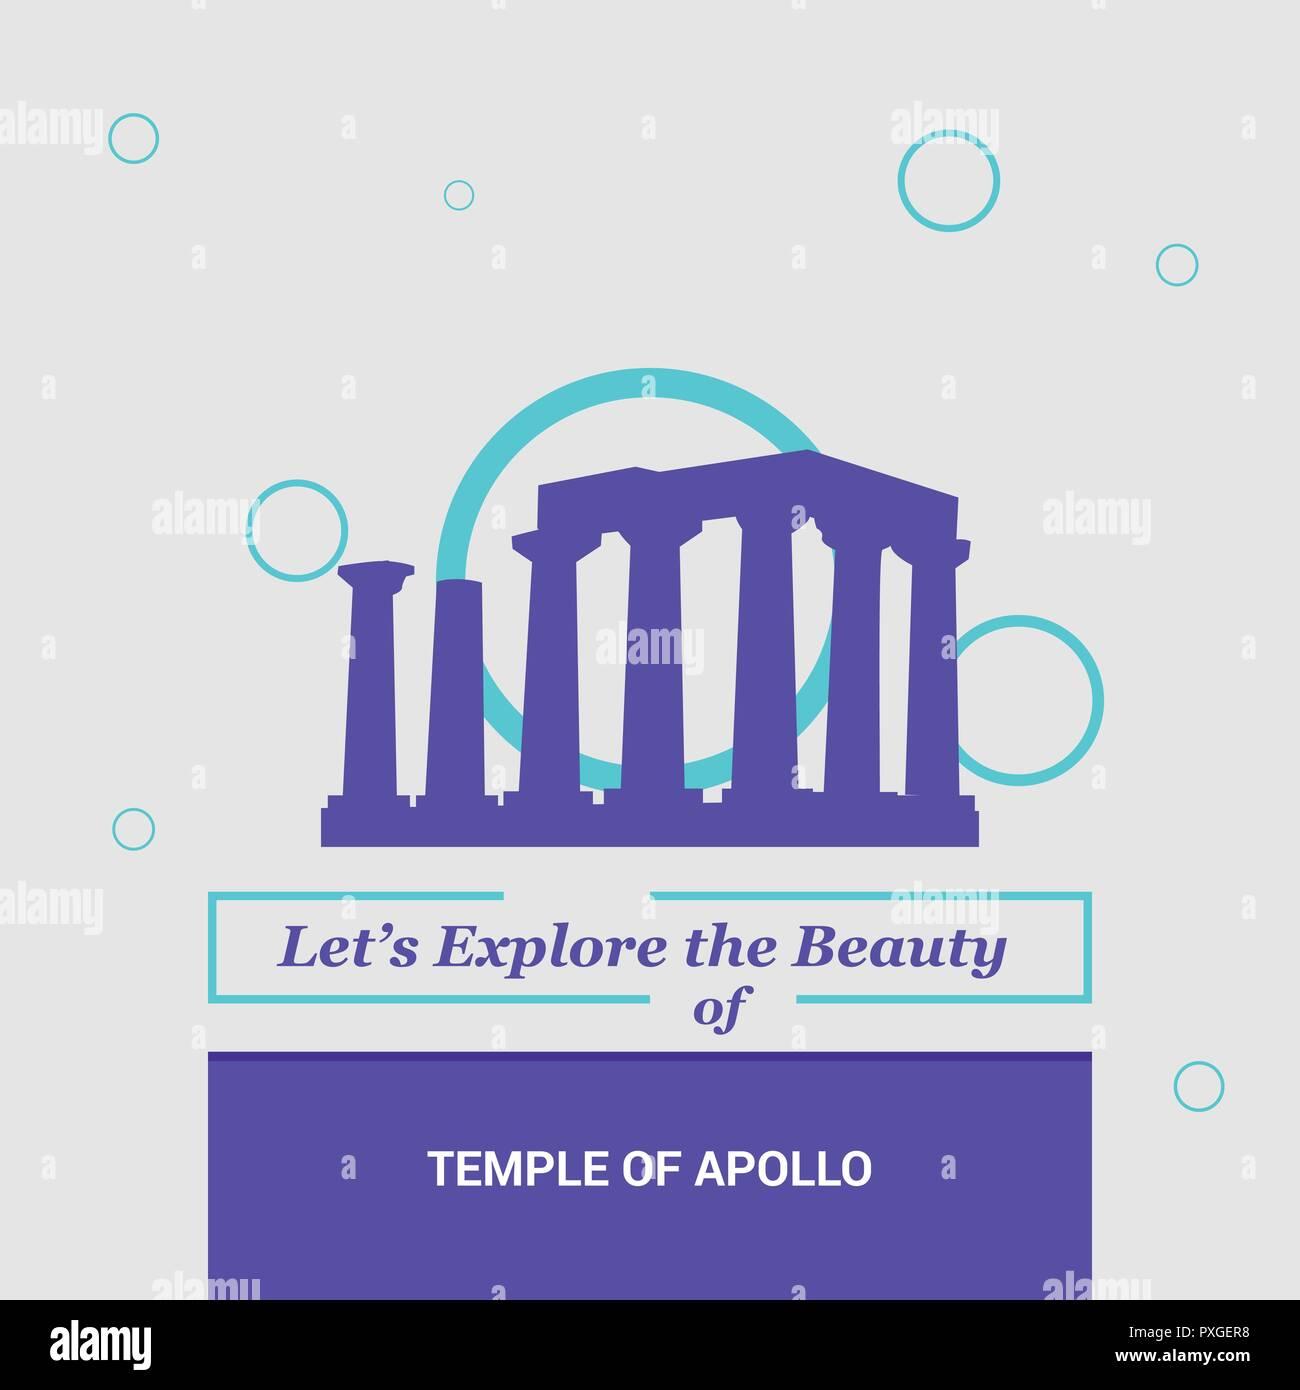 Let's Explore the beauty of Temple of Apollo Attica, Greece. National Landmarks - Stock Vector